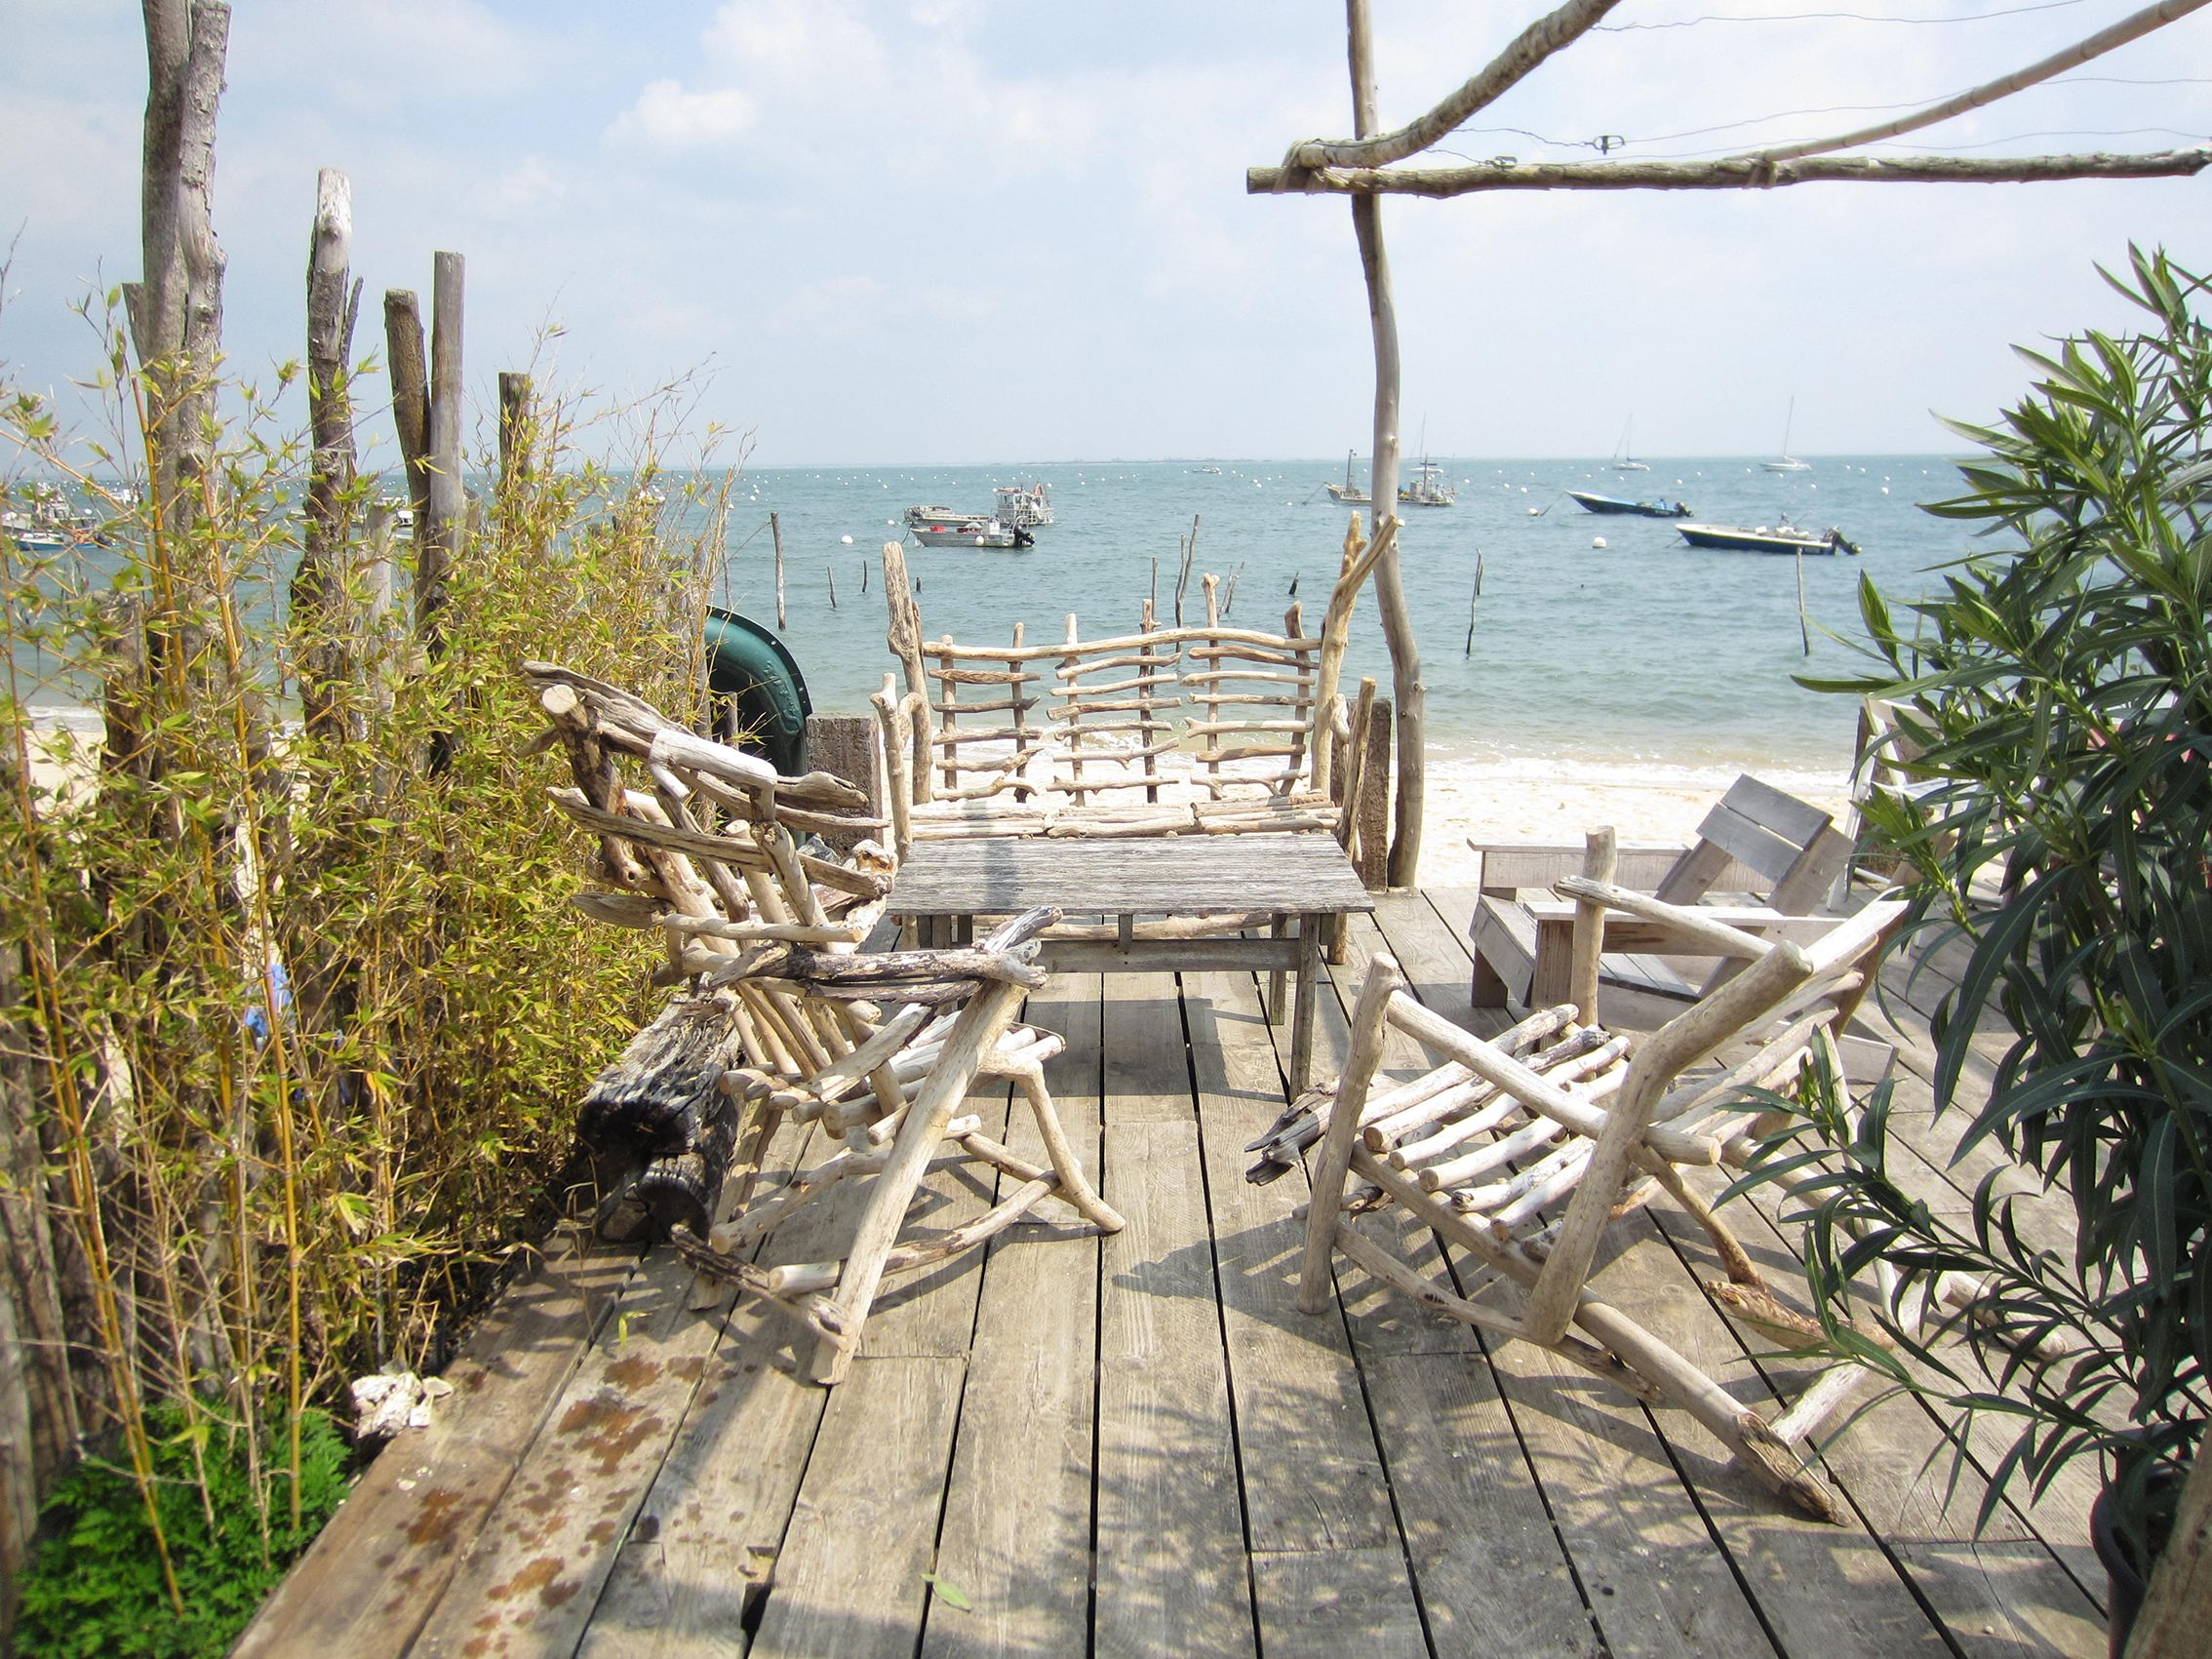 Salon de jardin en bois flotté - Mailleraye.fr jardin